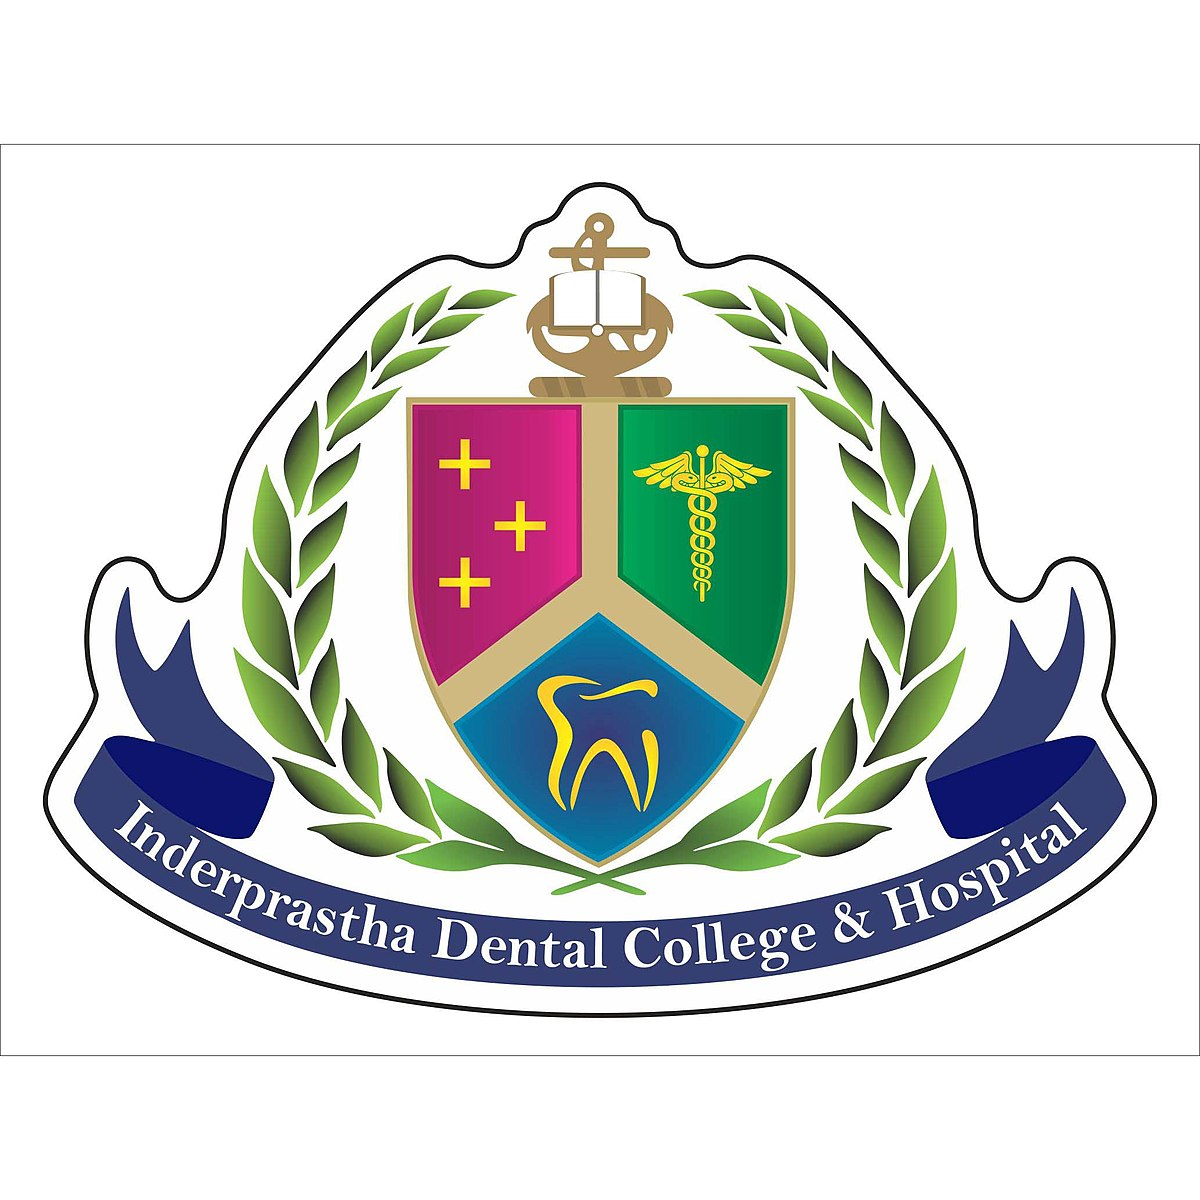 Inderprastha Dental College and Hospital, Ghaziabad